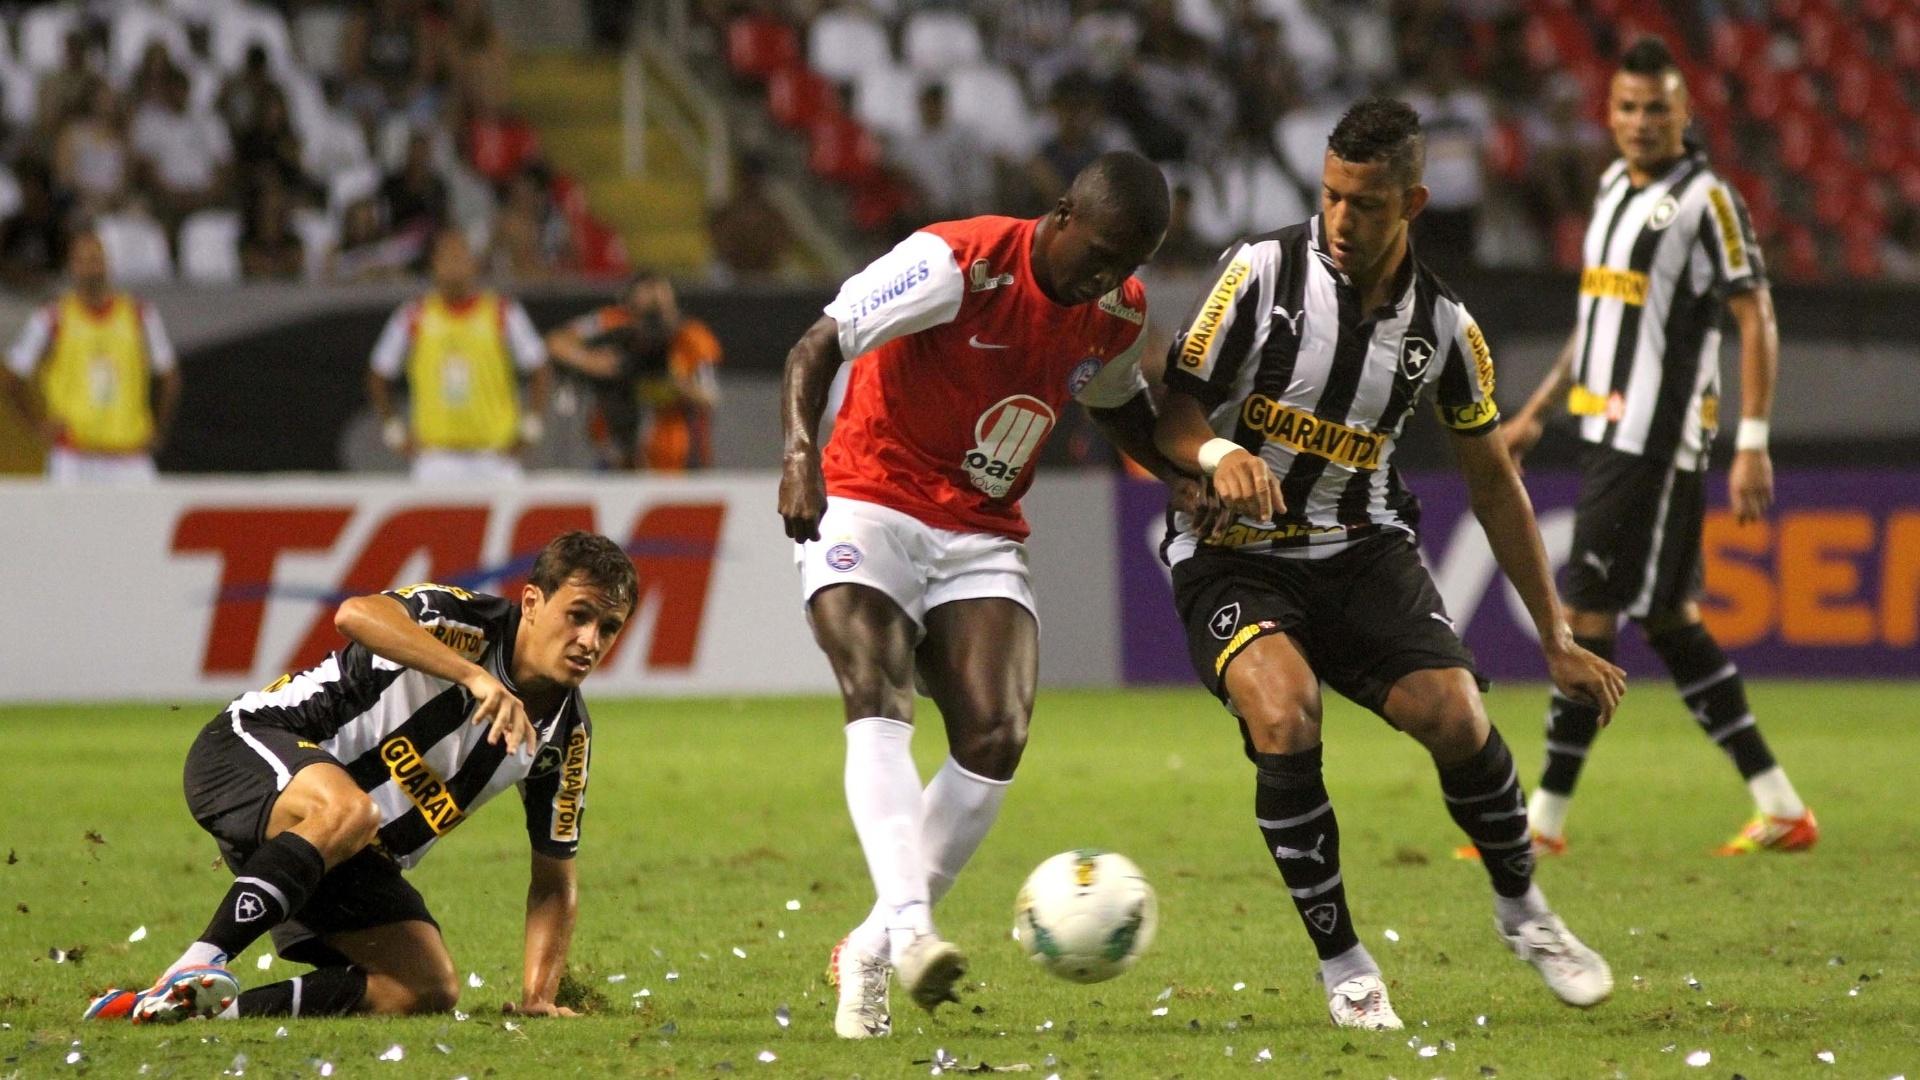 Atacante do Bahia, Jones tenta passar por Antônio Carlos, zagueiro do Botafogo